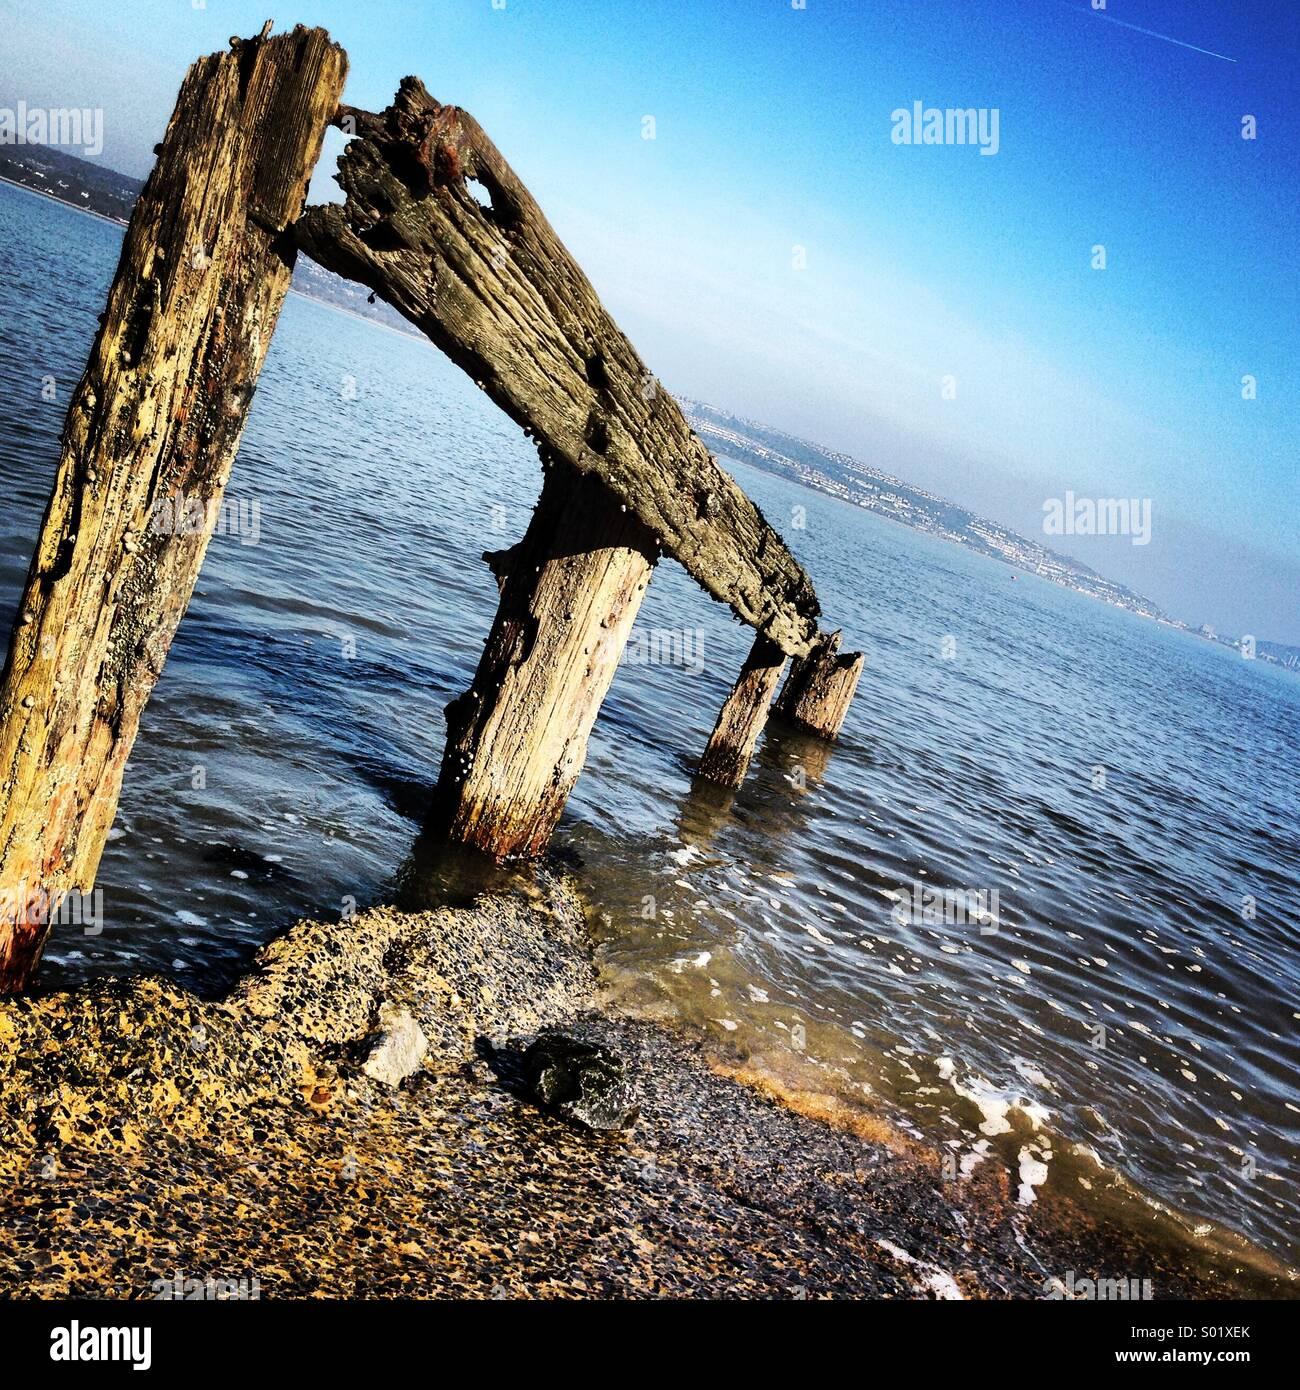 Sea. The Mumbles. - Stock Image